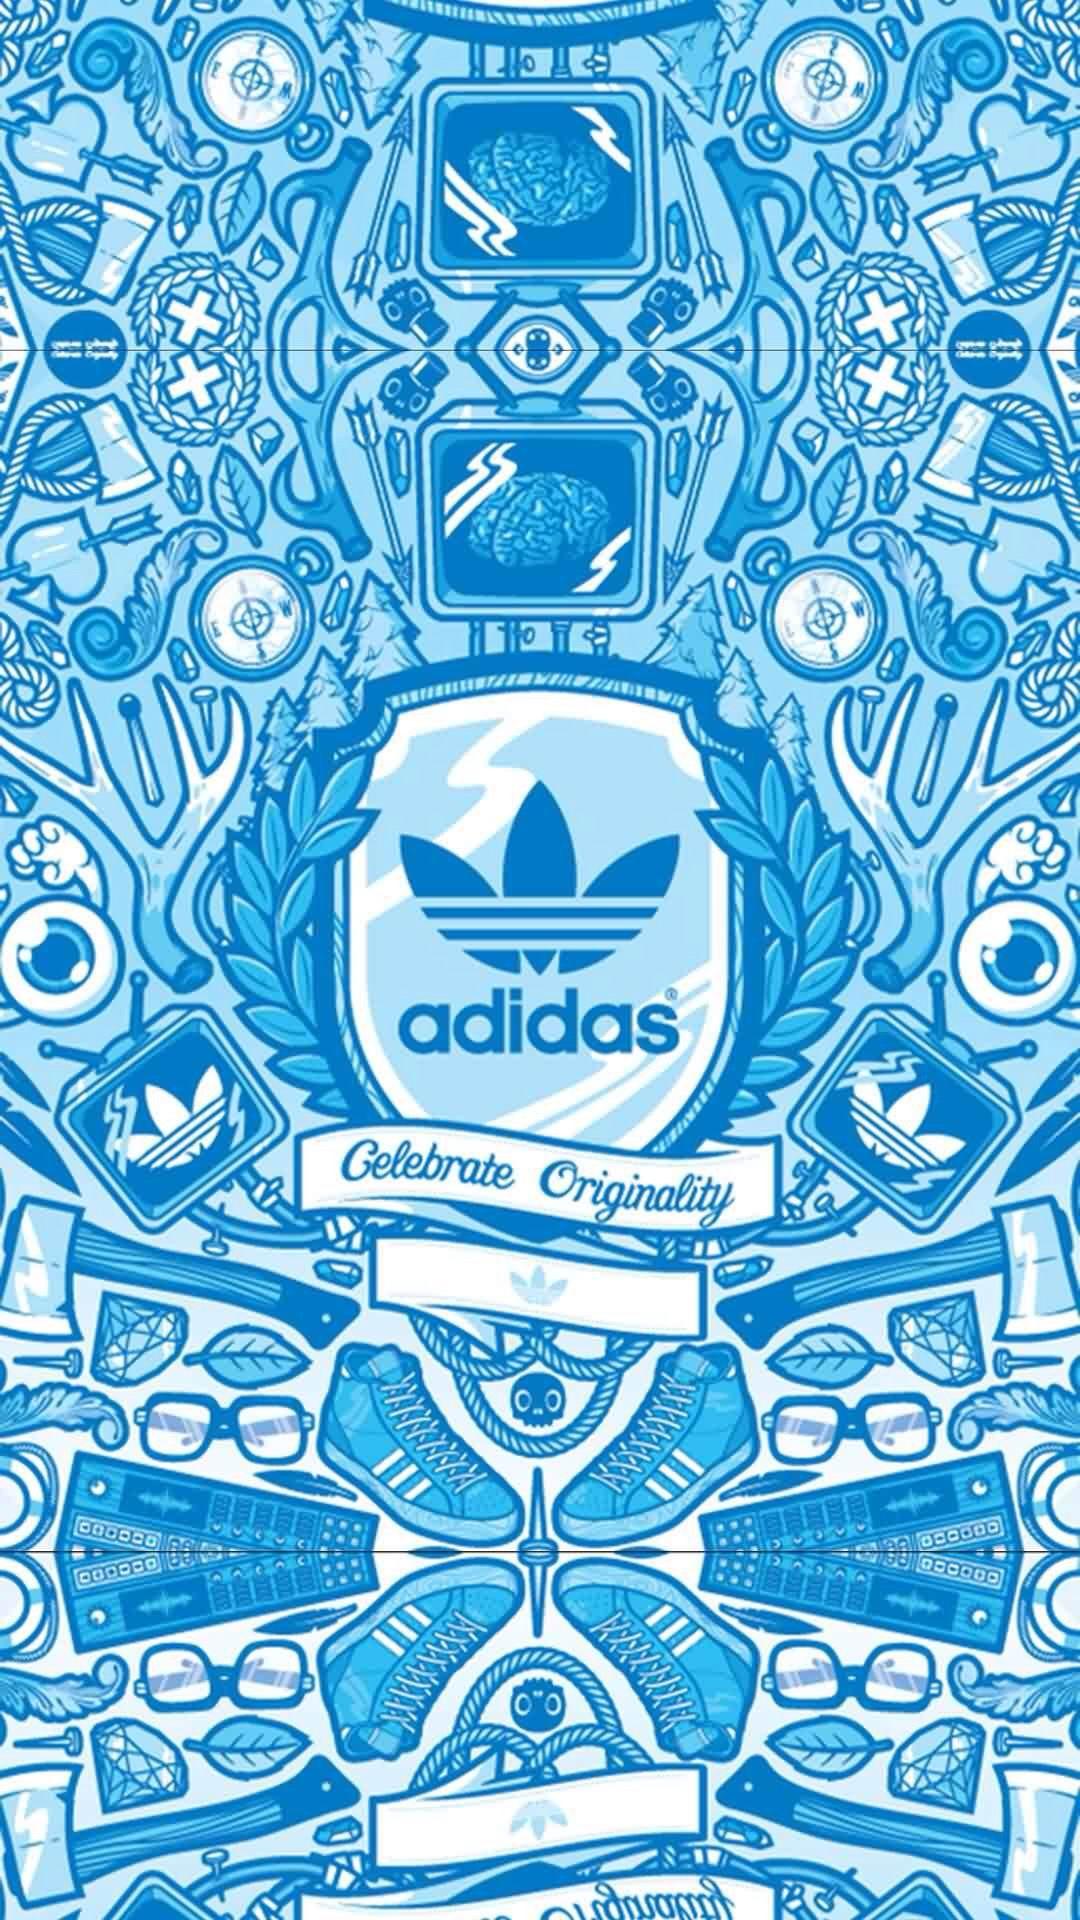 Adidas三叶草手机壁纸图片